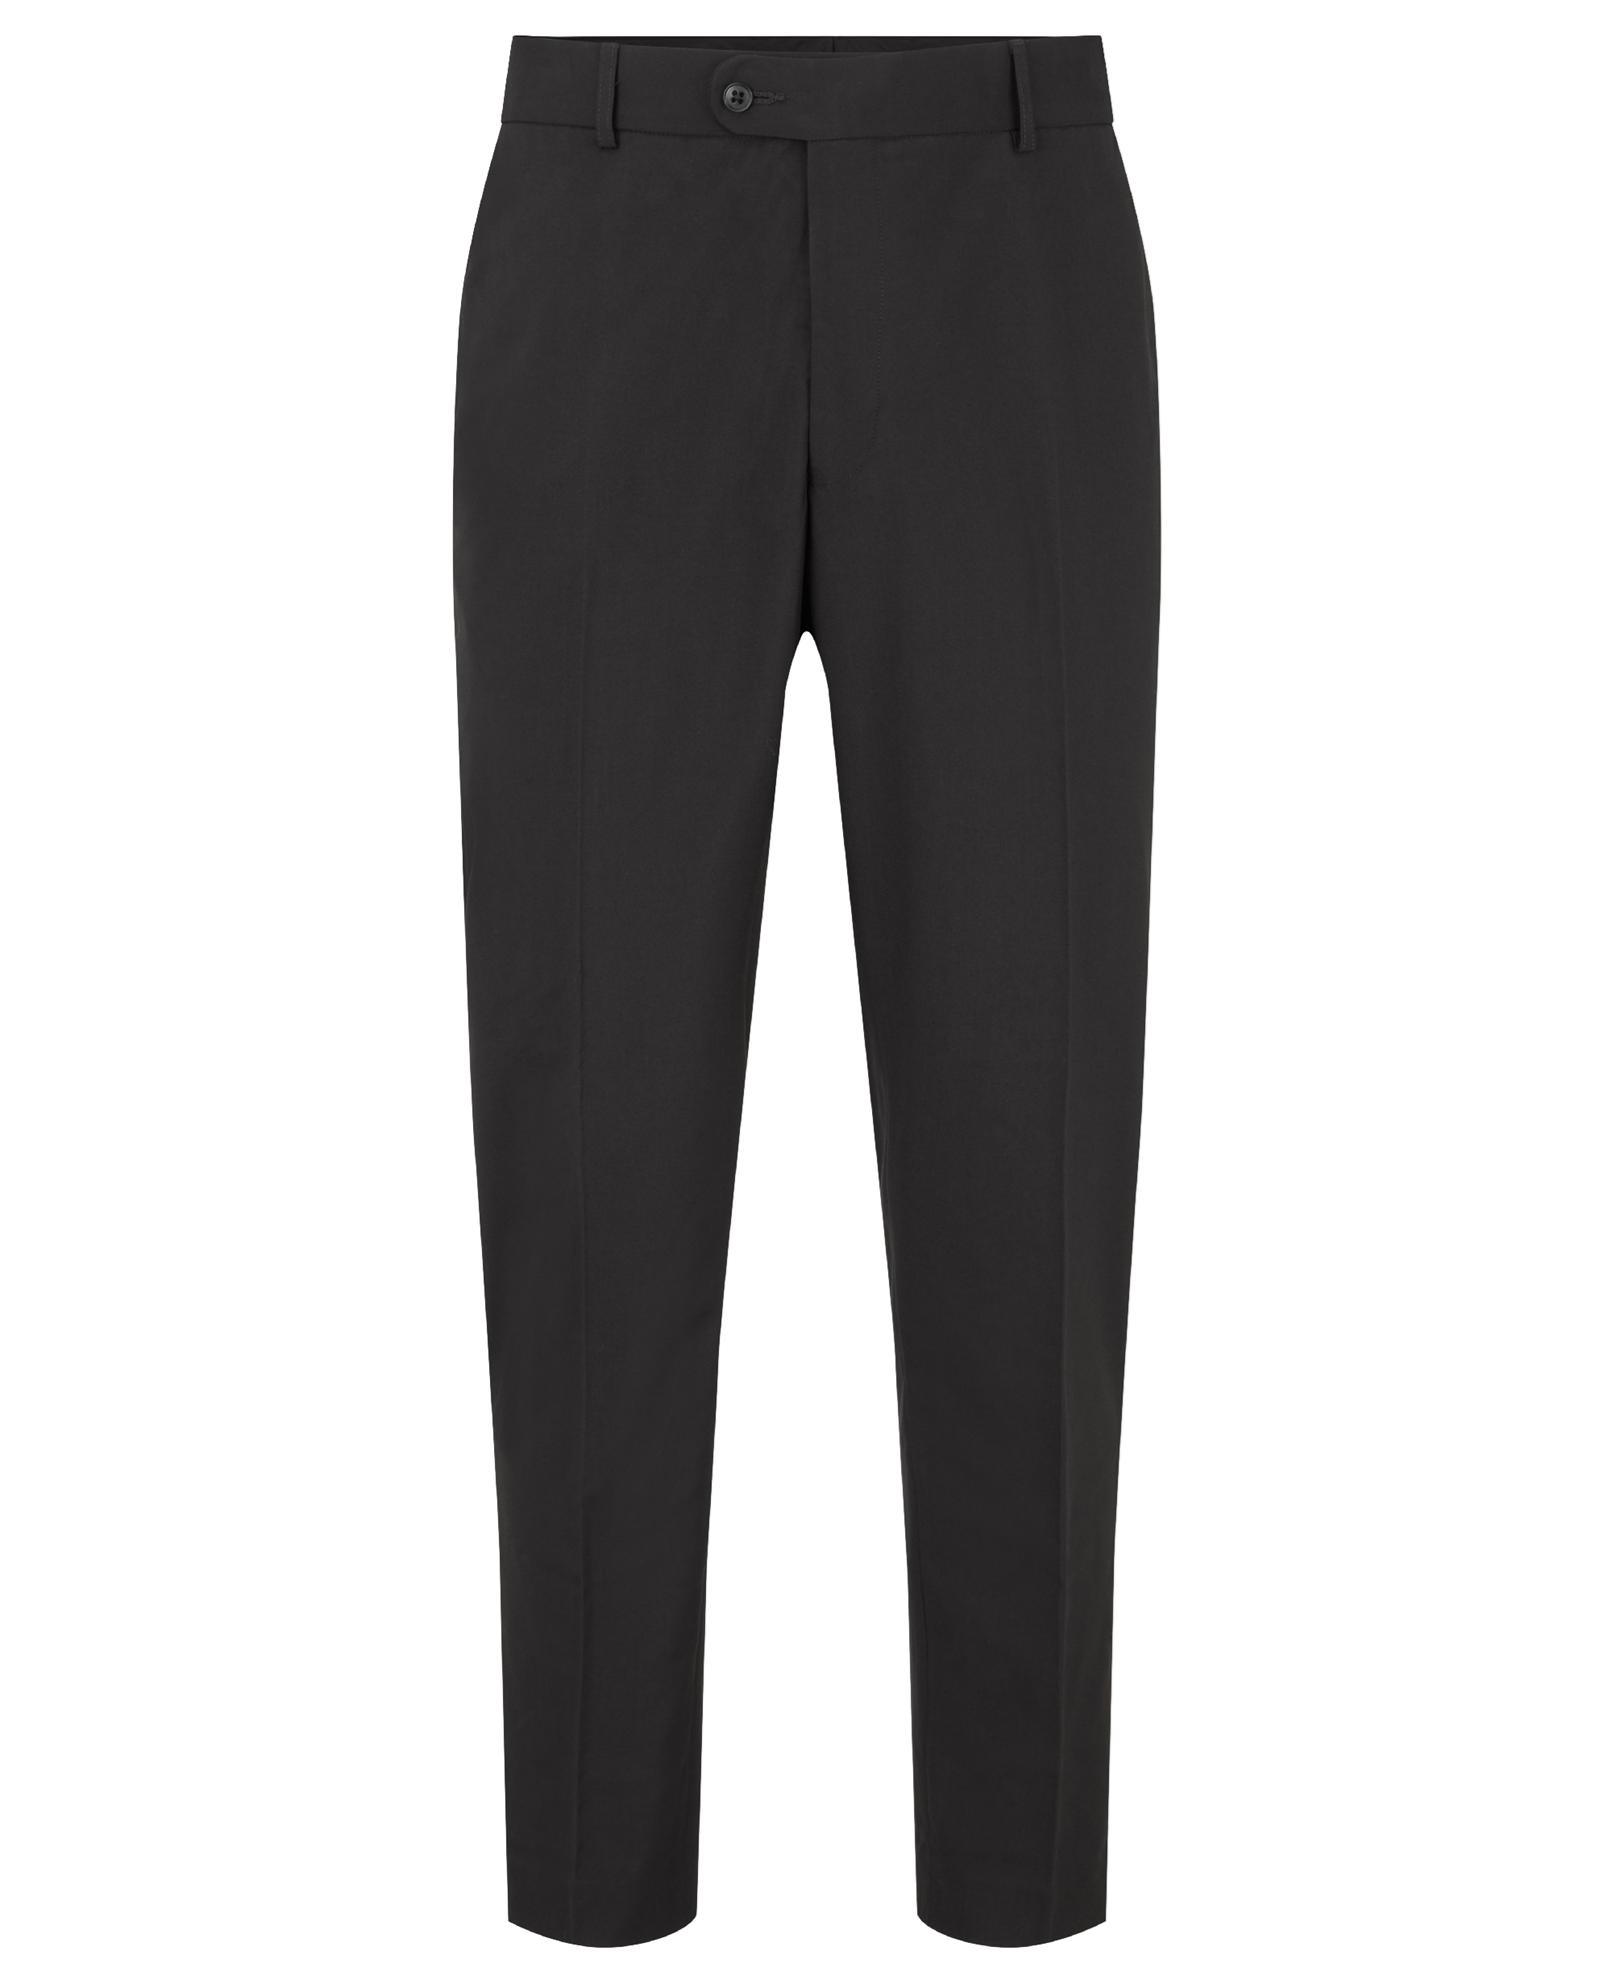 Picture of Harrow Men's Trouser - Black